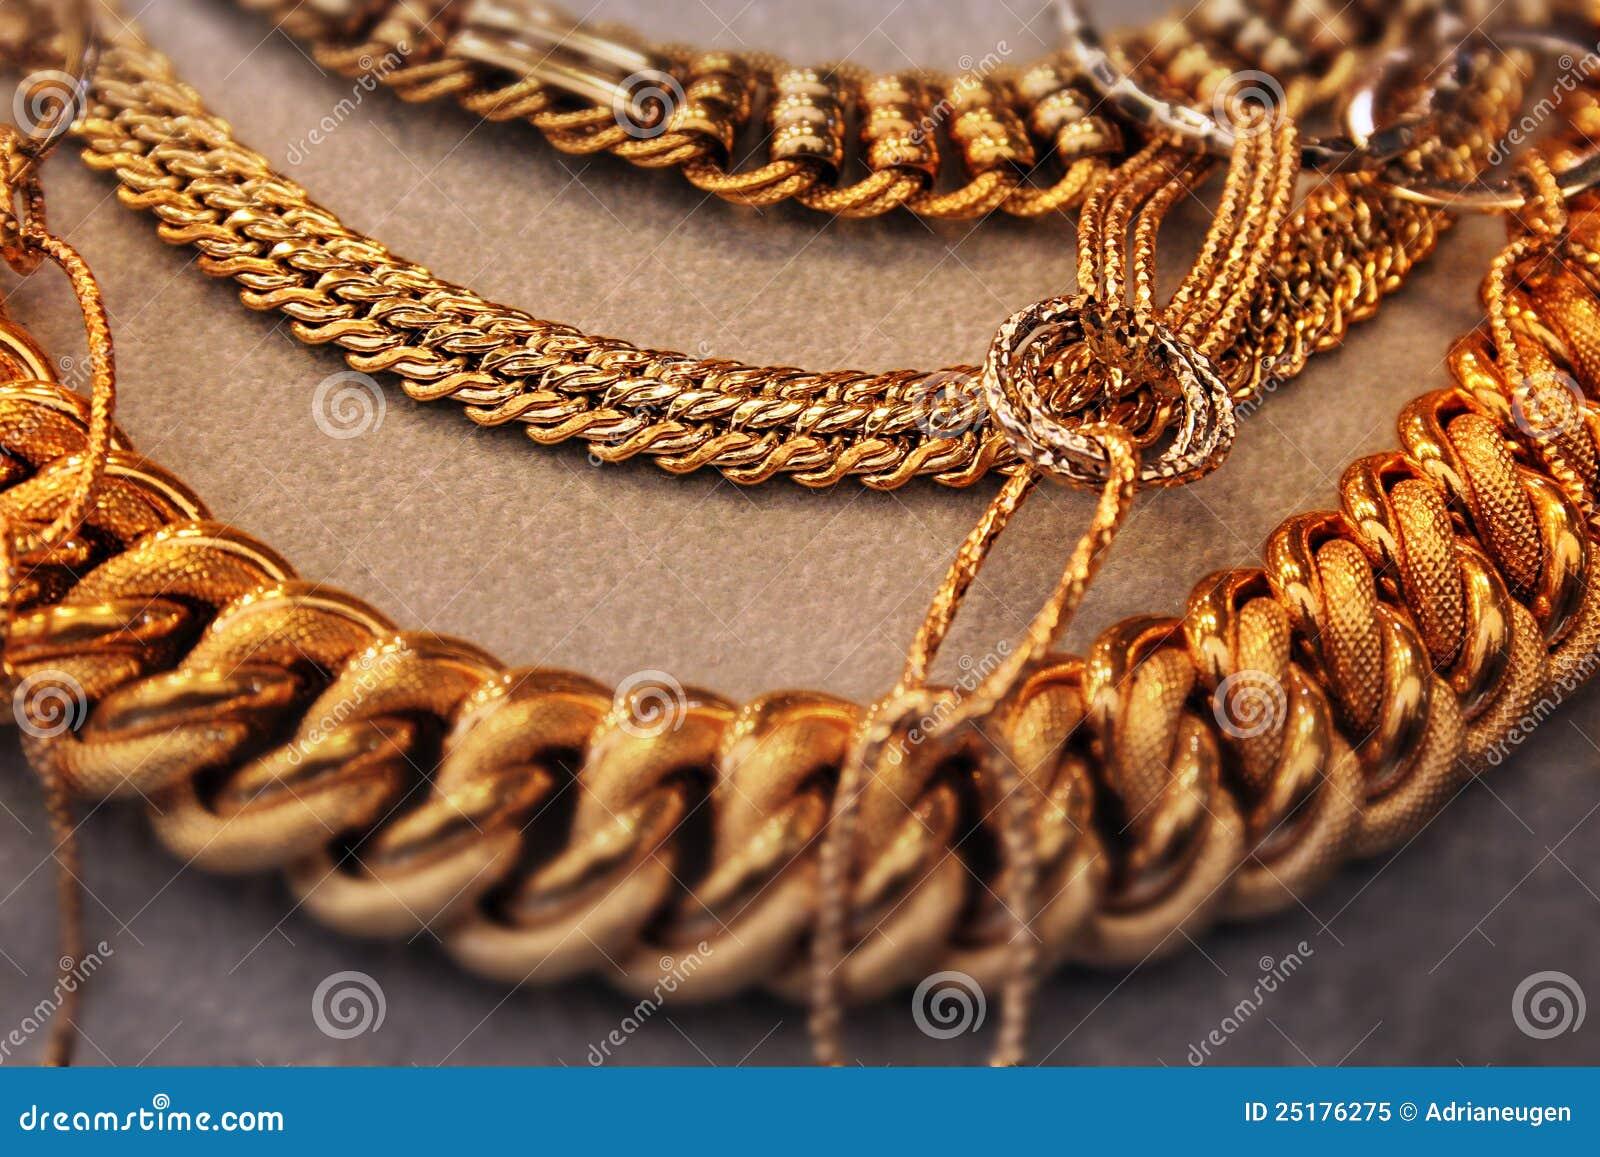 Download Golden massive necklace stock image. Image of detail - 25176275